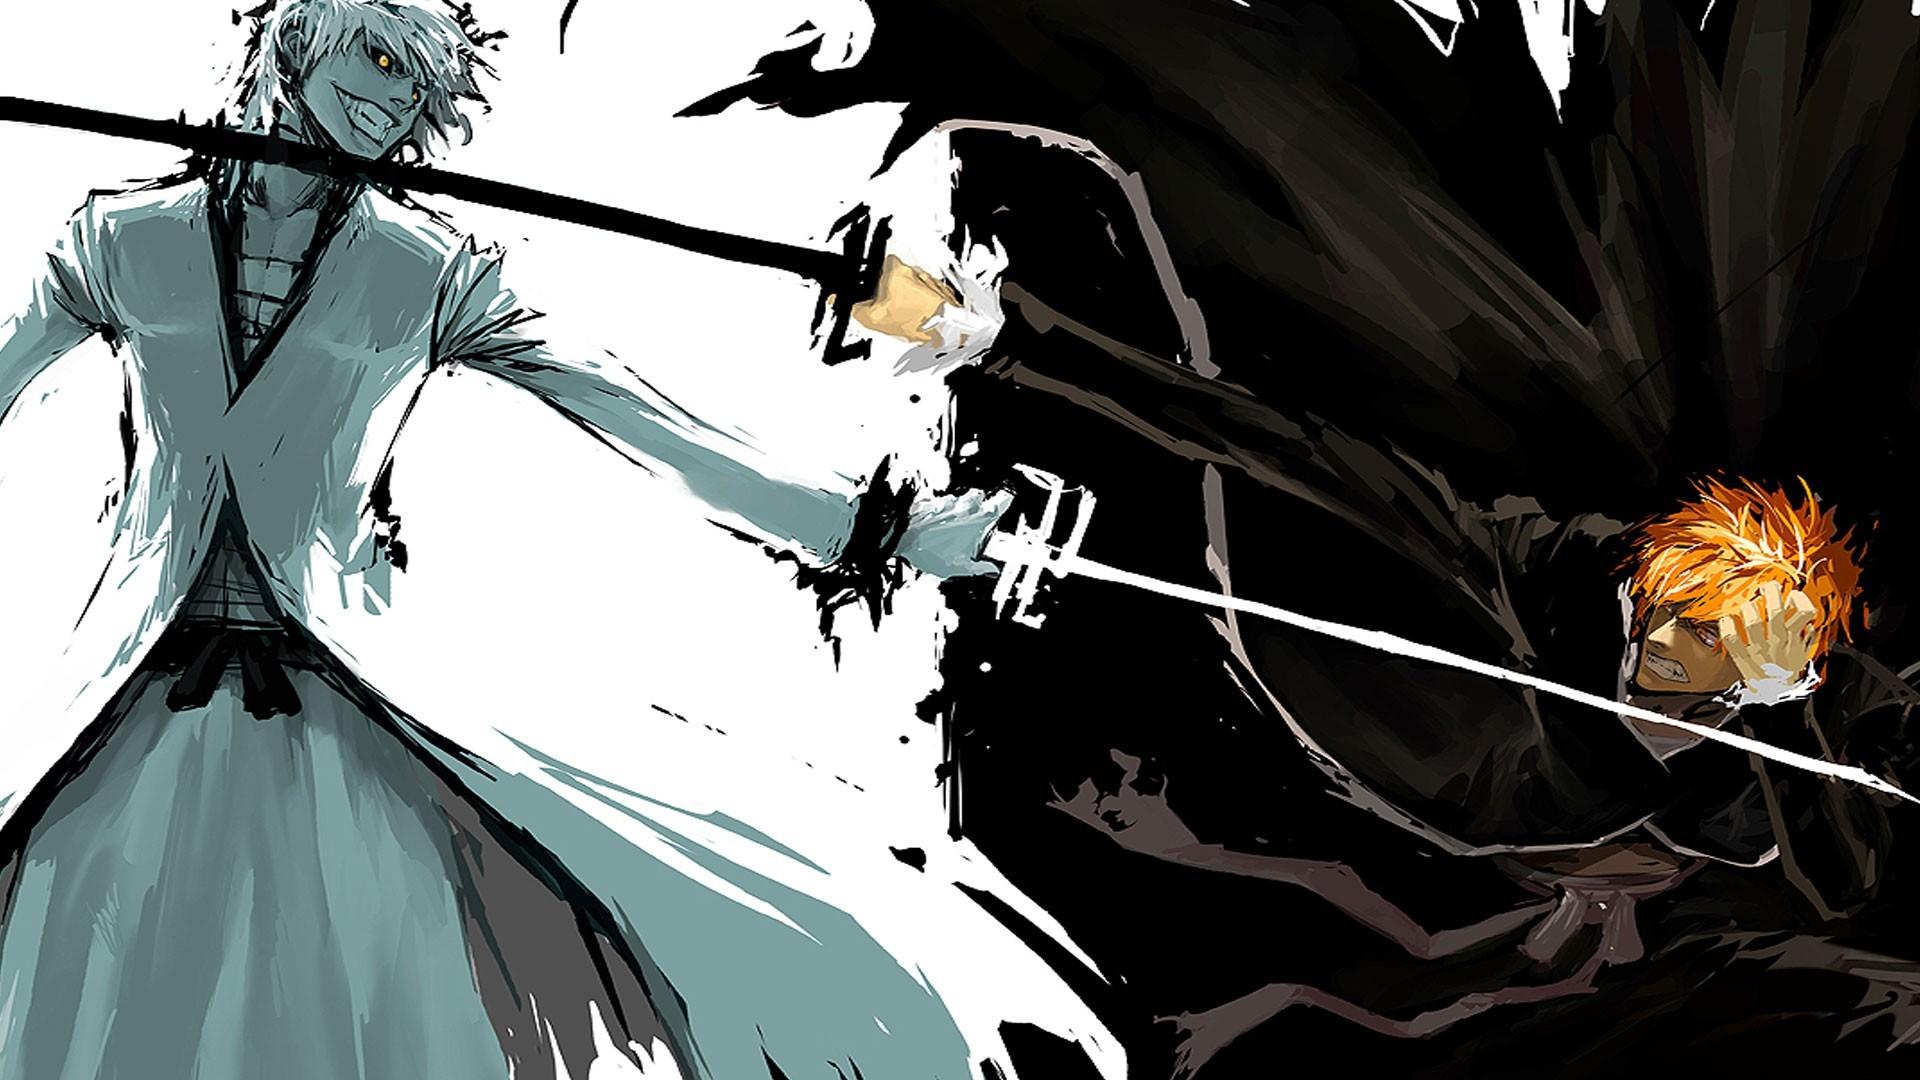 Bleach, Sketches, Anime Boys, Sword, Fighting, Kurosaki Ichigo, Hollow